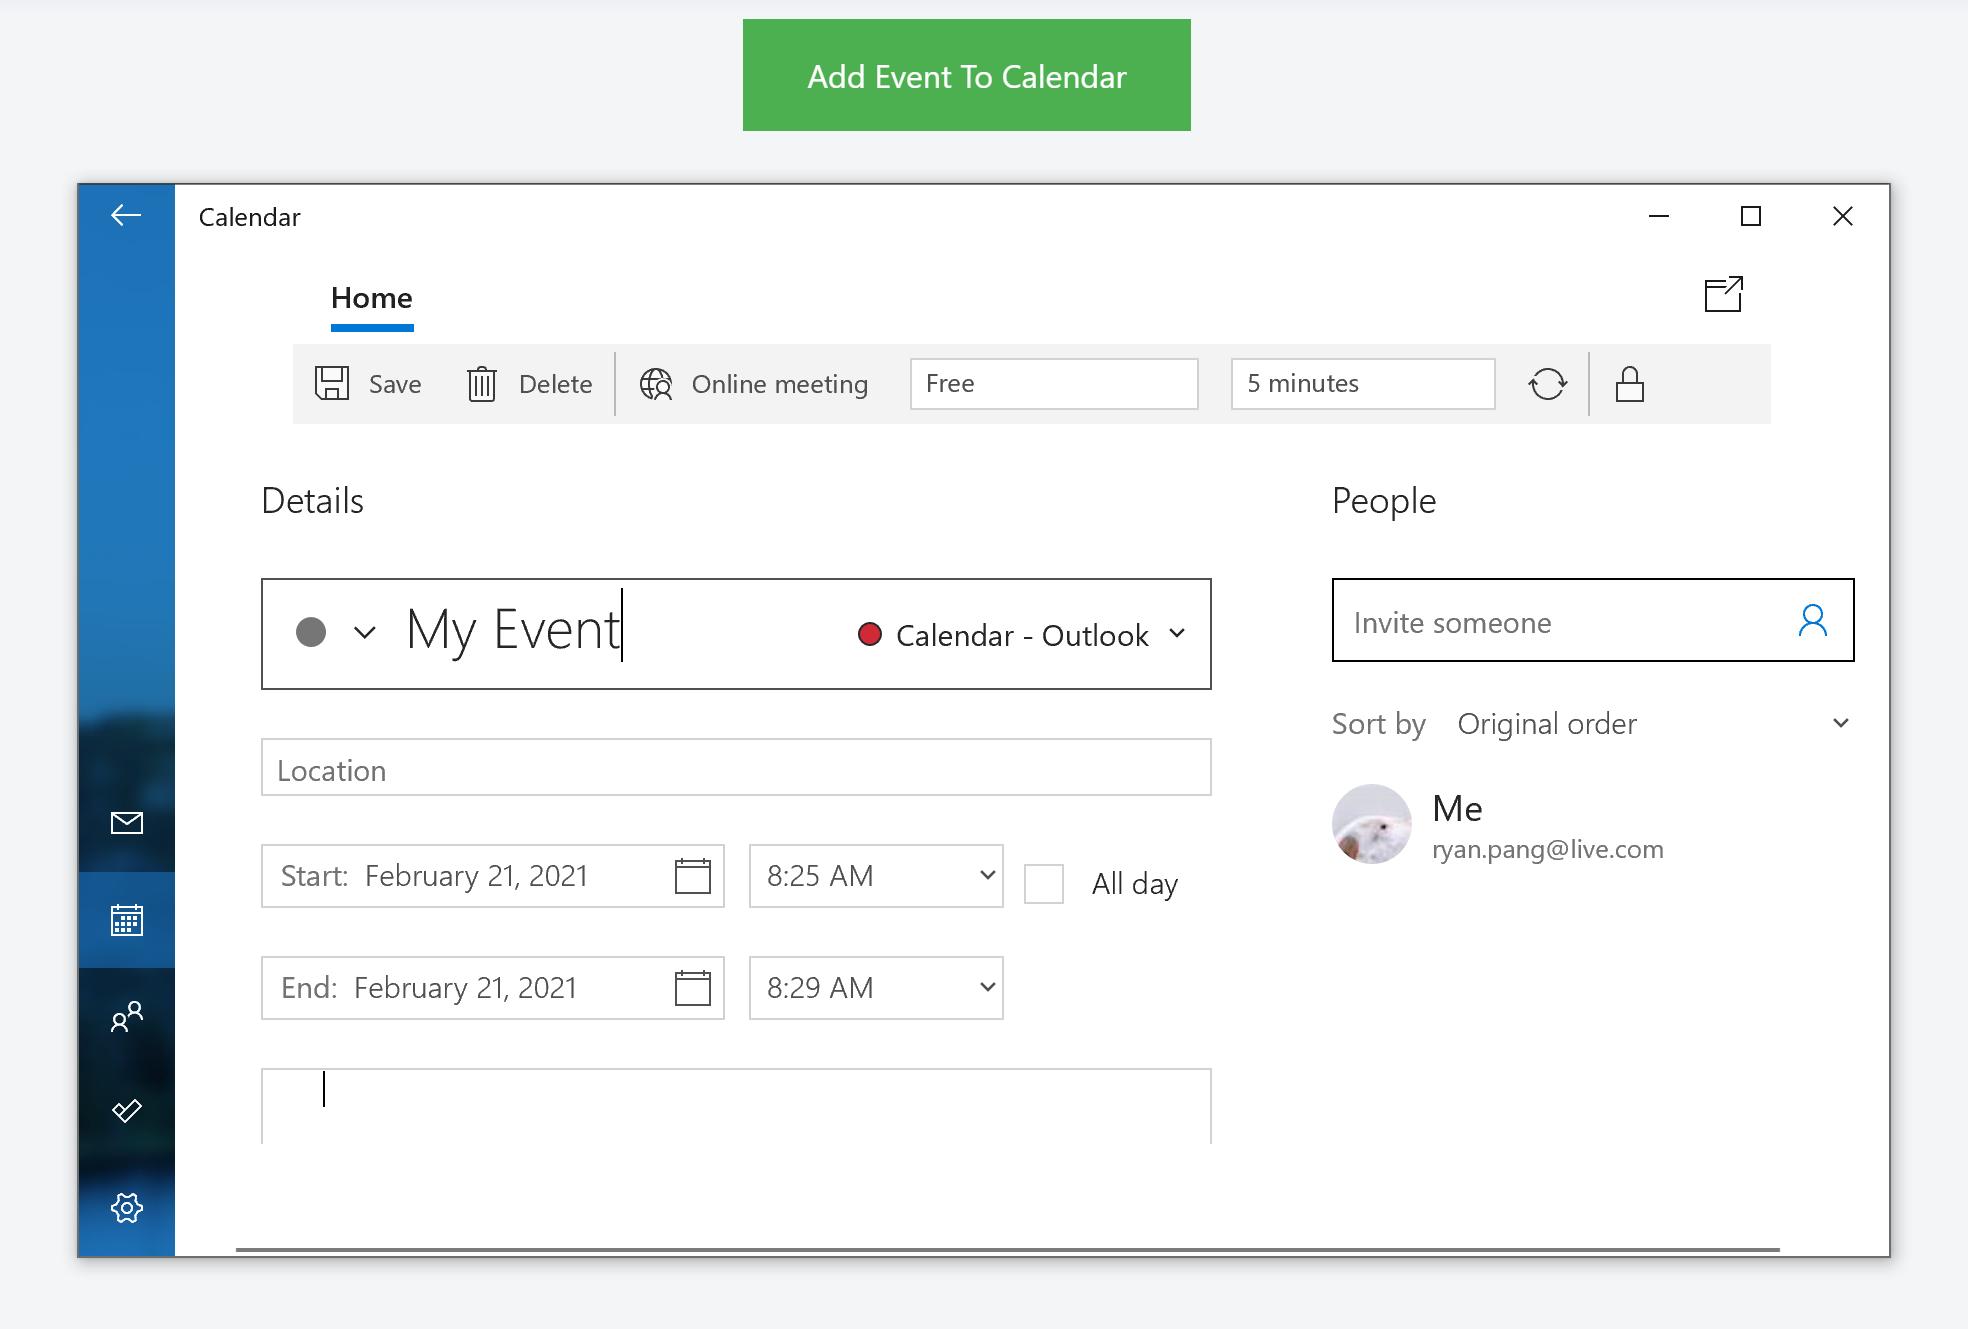 Add Event to Calendar on Windows